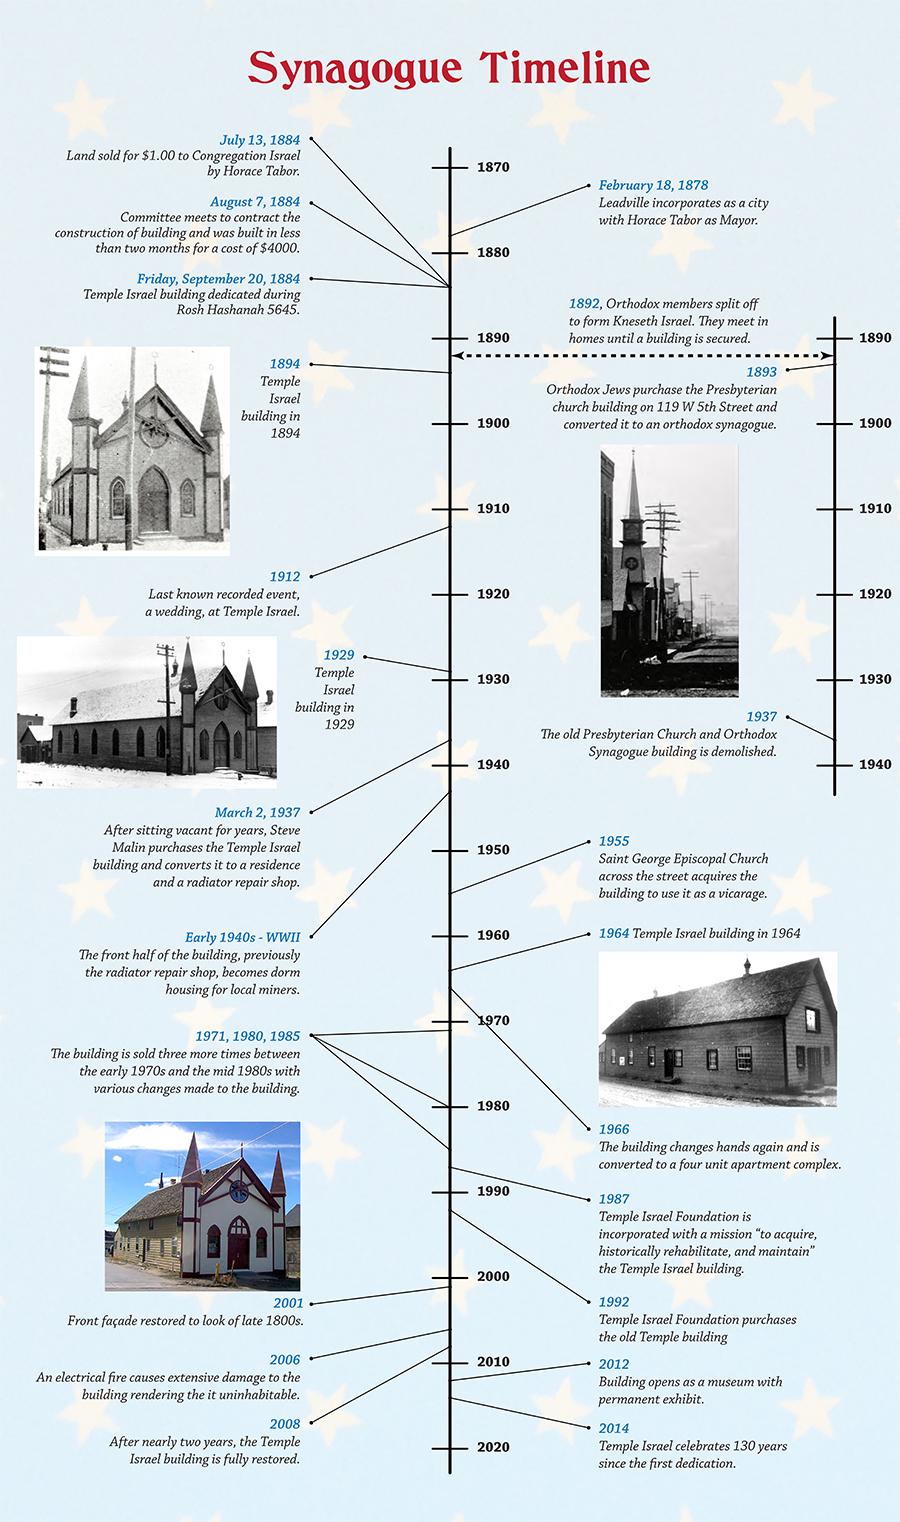 temple israel building timeline